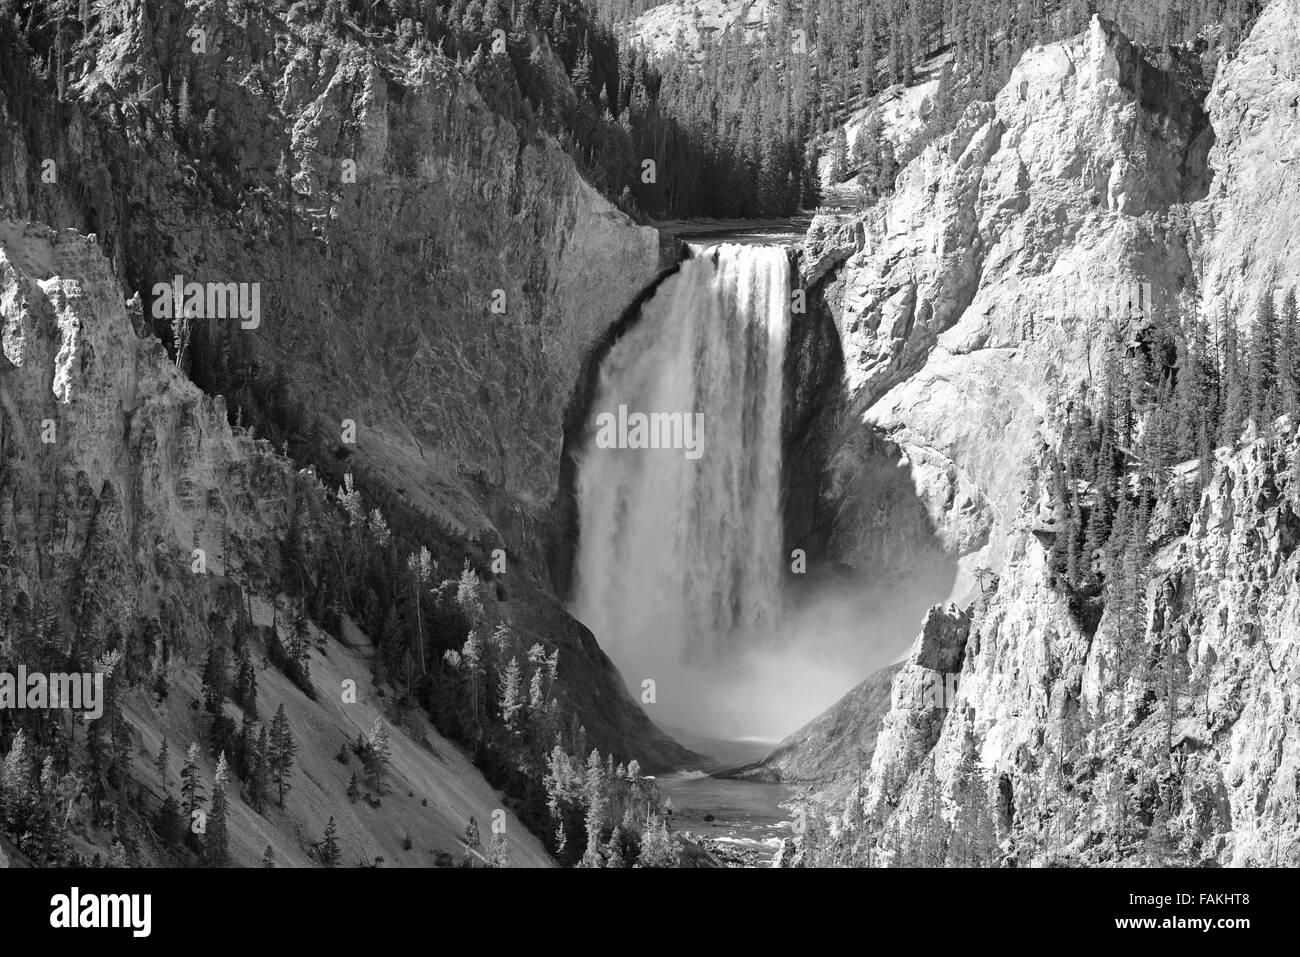 Yellowstone Falls, in Yellowstone National Park, Wyoming, USA - Stock Image